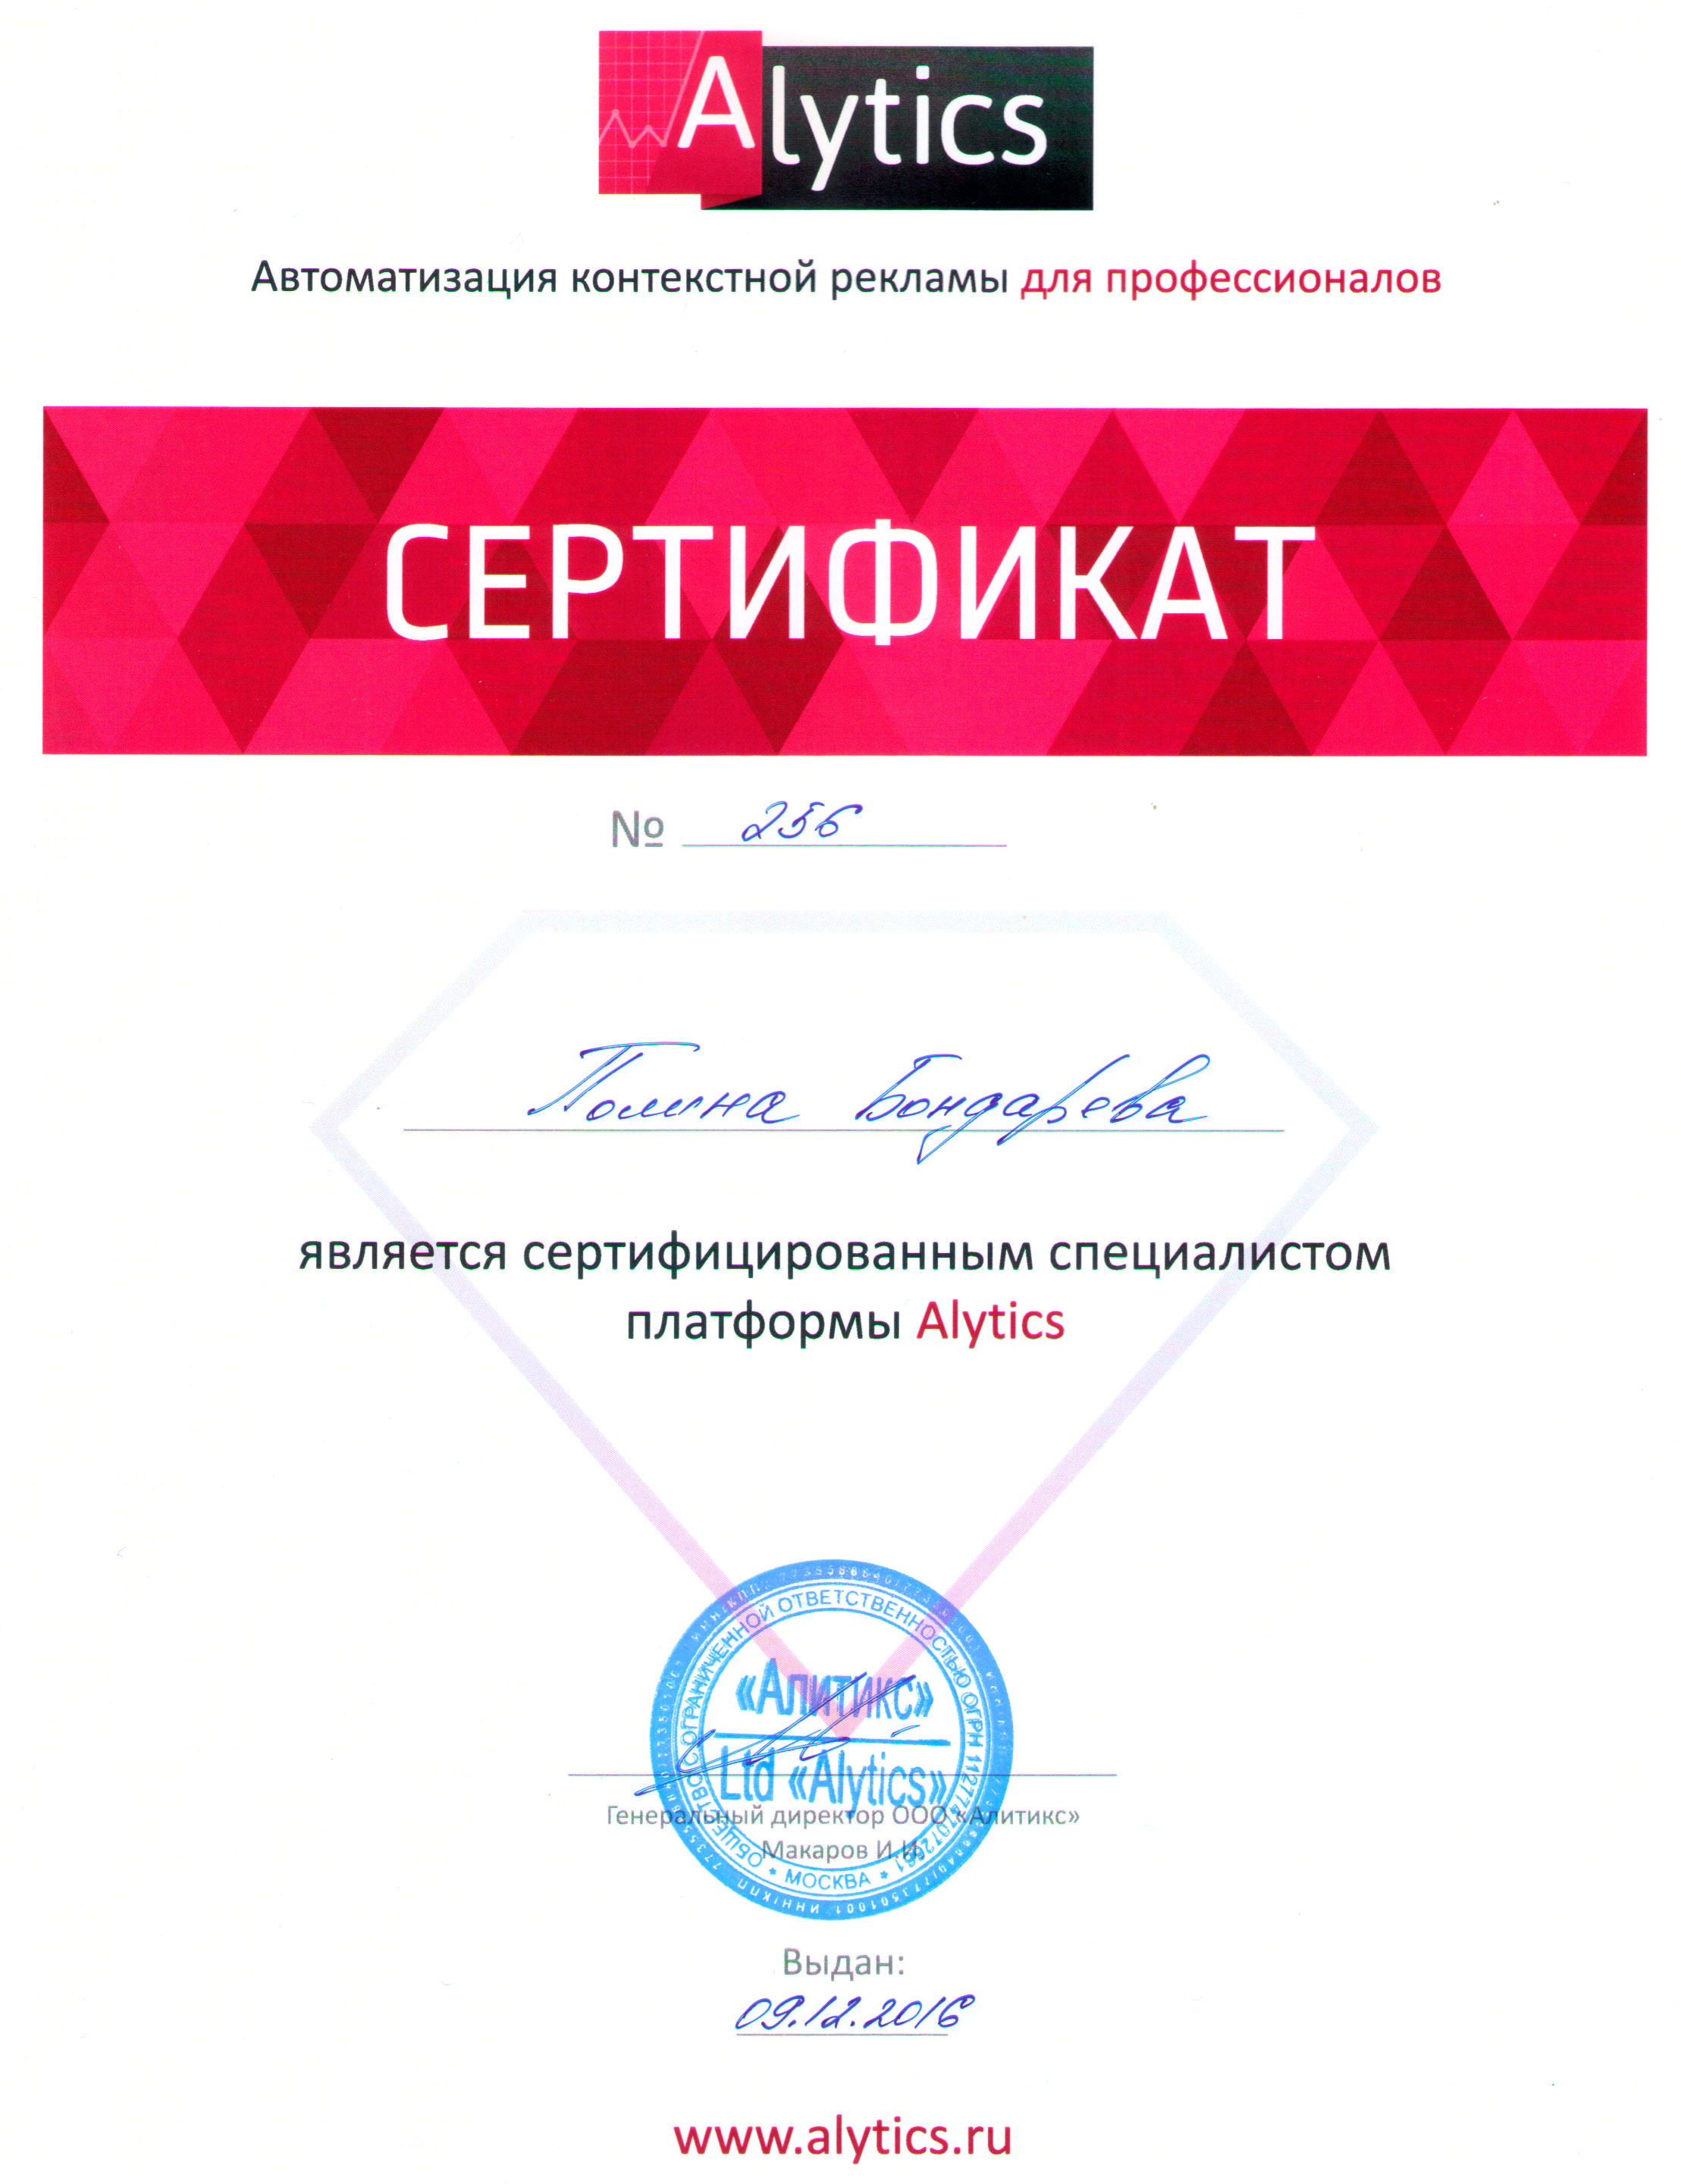 Сертификат специалиста Alytics